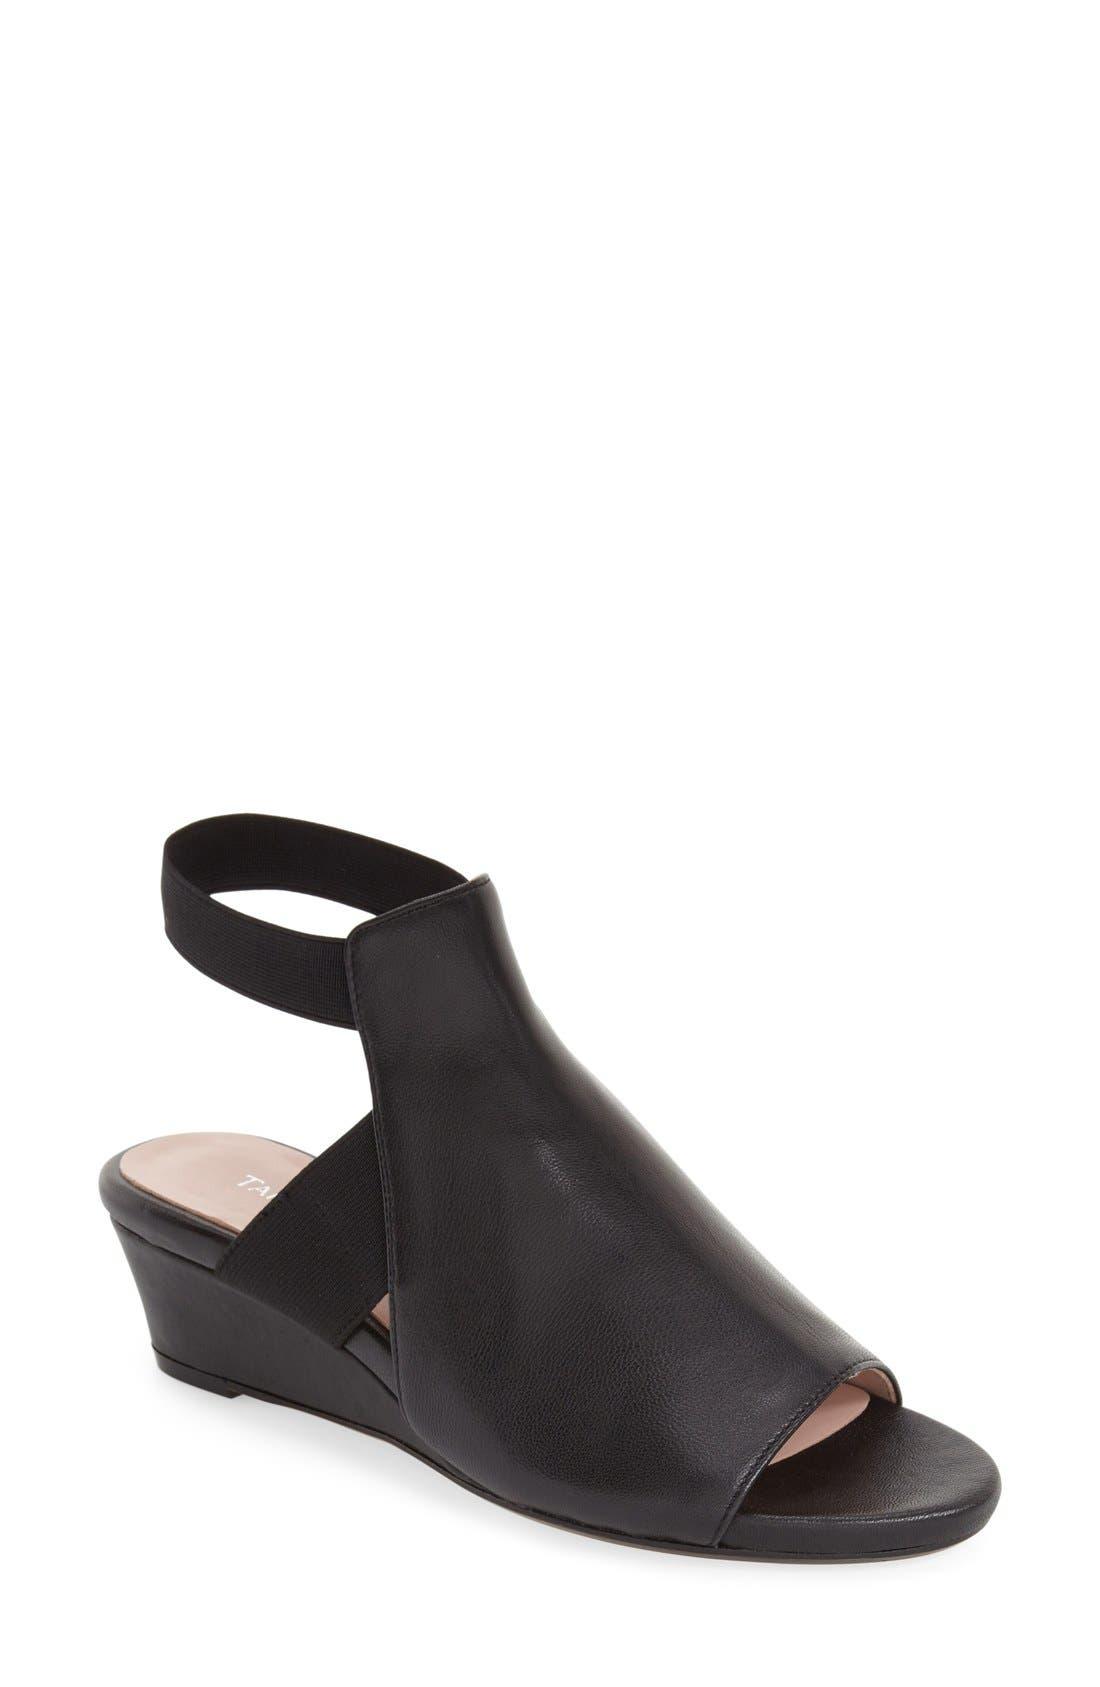 Main Image - Taryn Rose 'Shye' Wedge Sandal (Women)